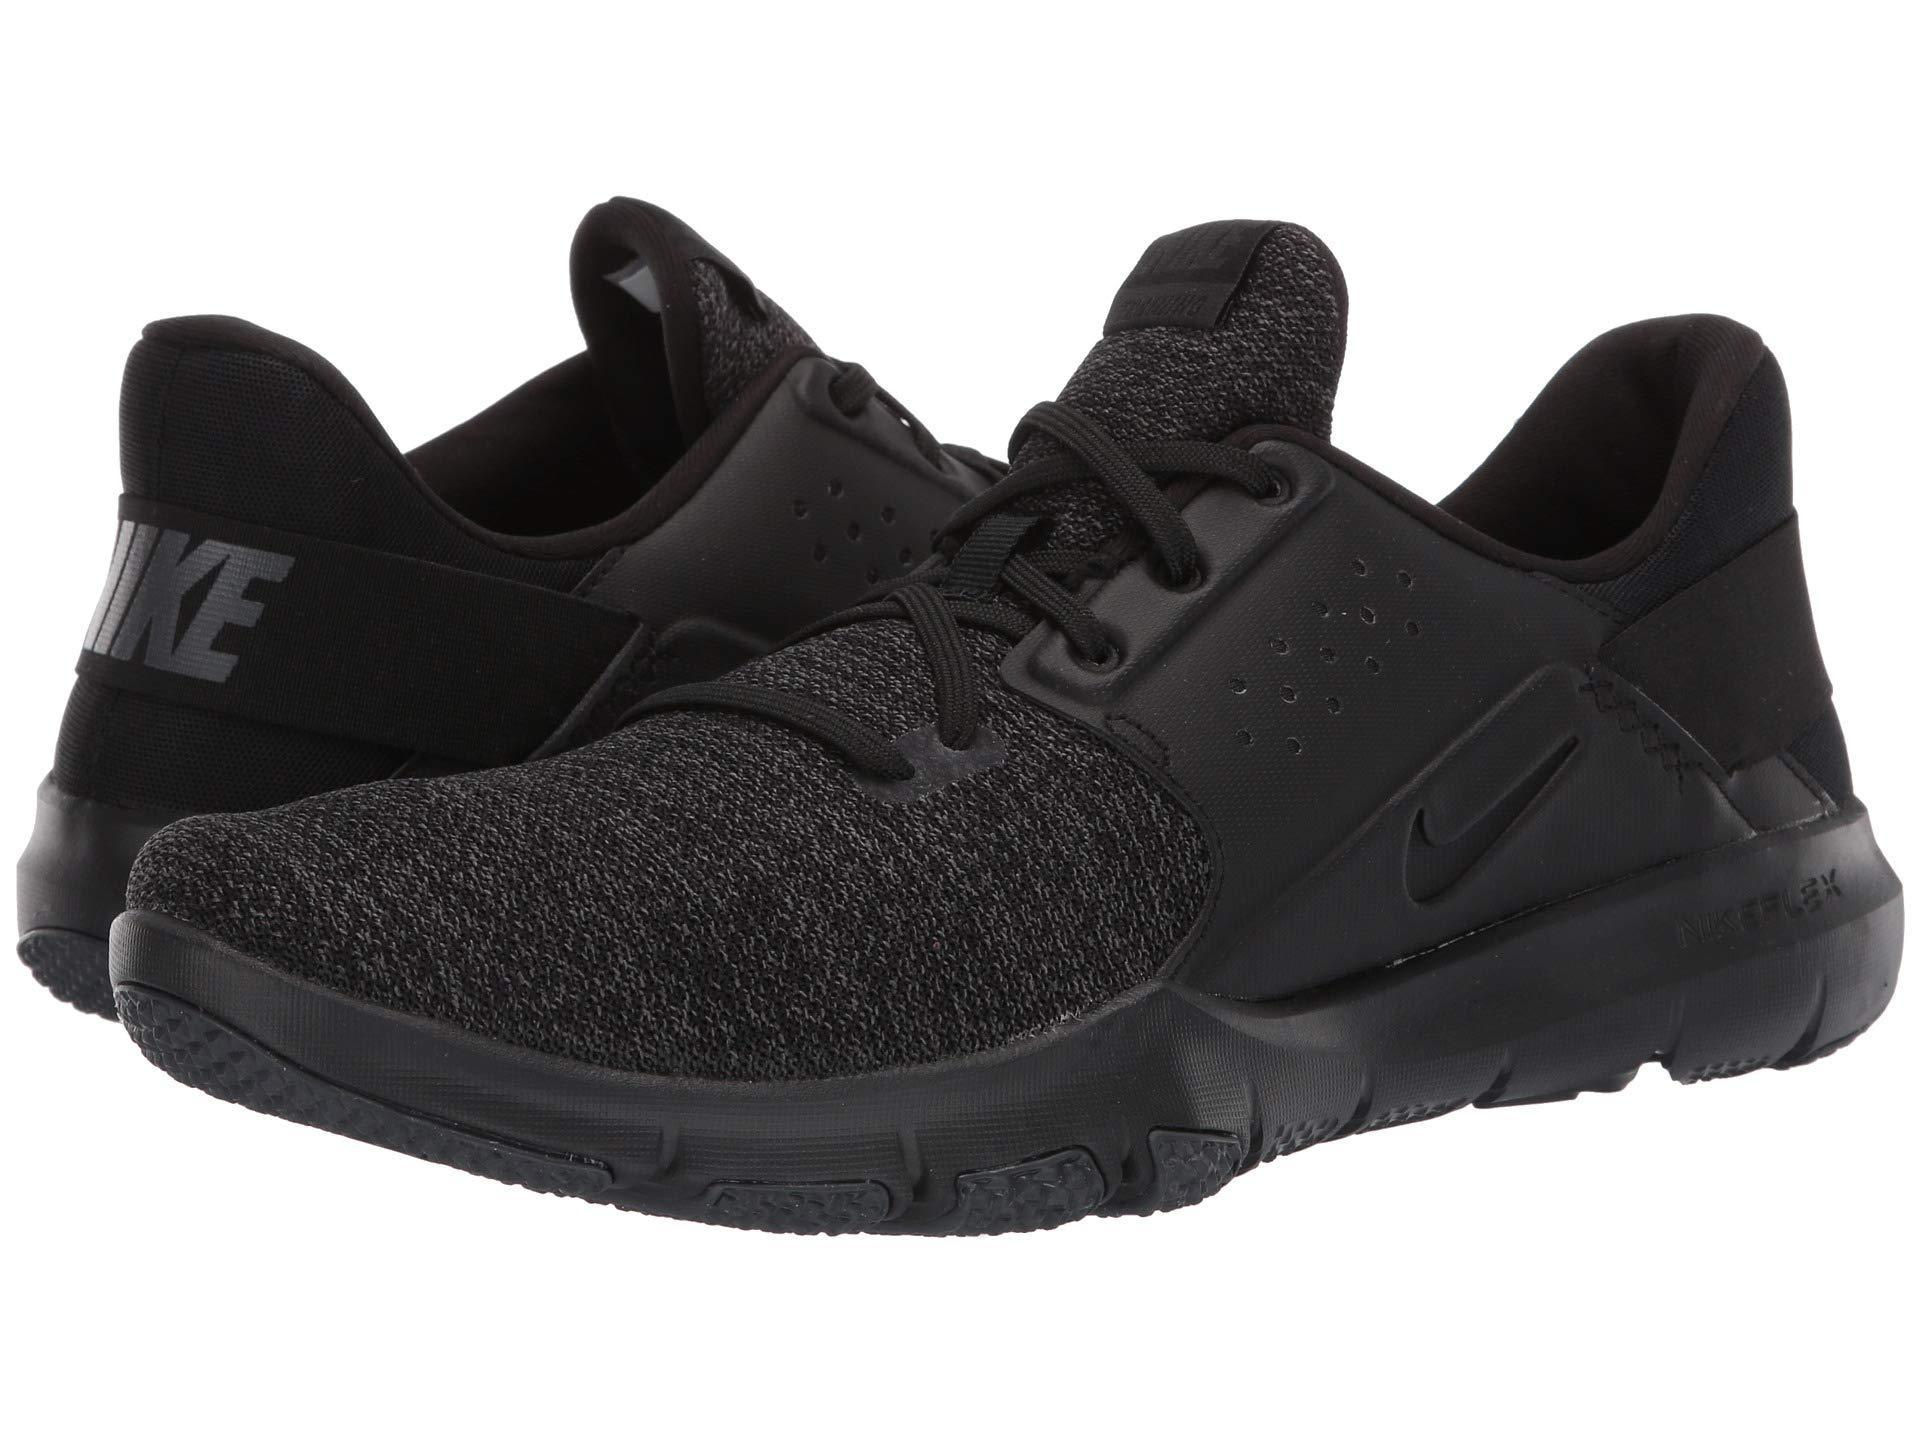 a11214c1fe40 Lyst - Nike Flex Control 3 (sequoia desert Moss medium Olive) Men s ...